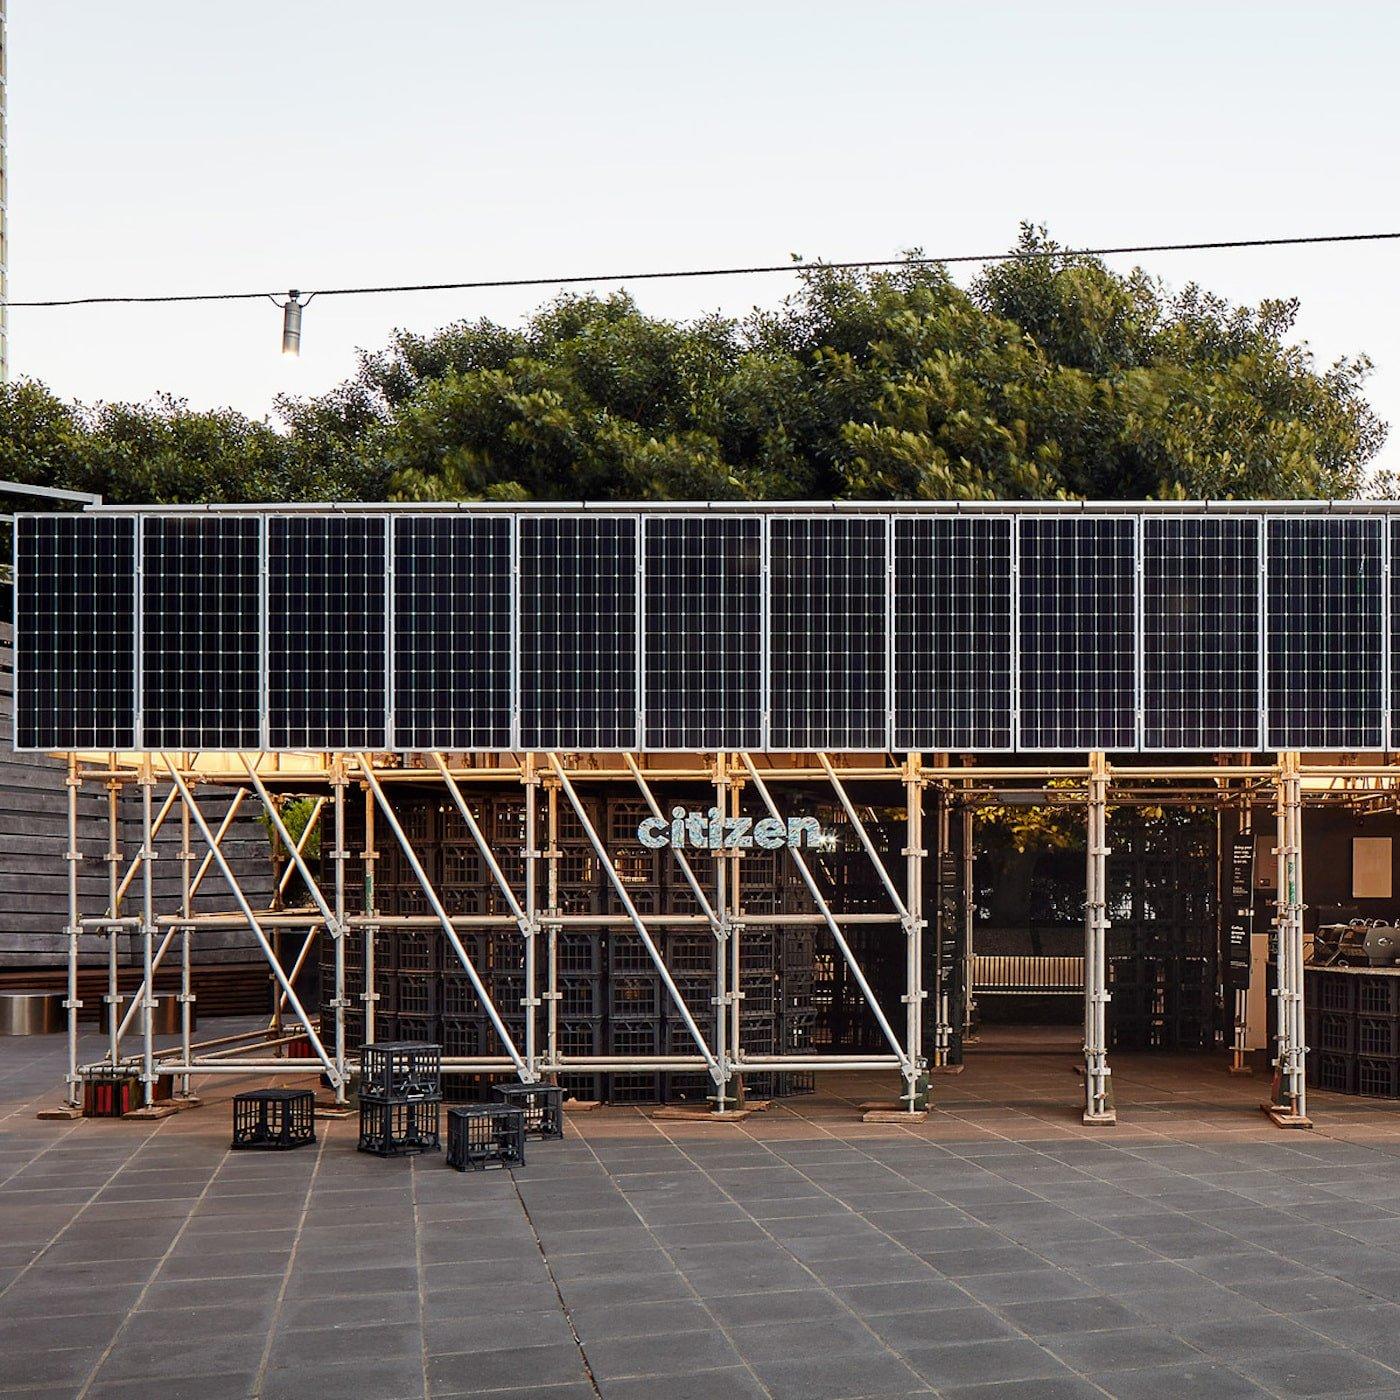 Close up external view of solar panels